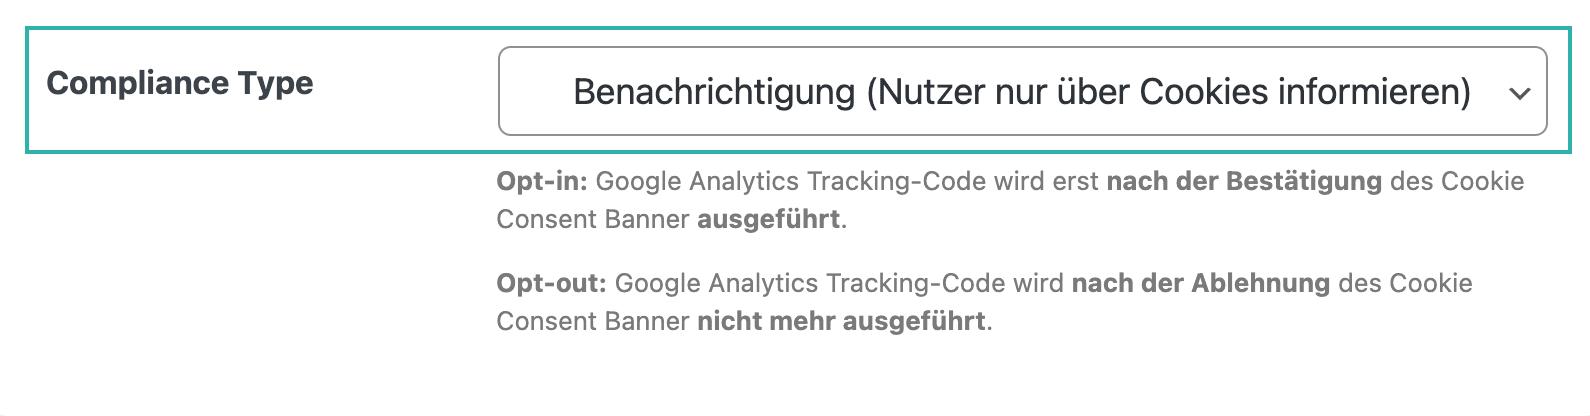 Google Analytics Germanized-compliance Type-info-cookies